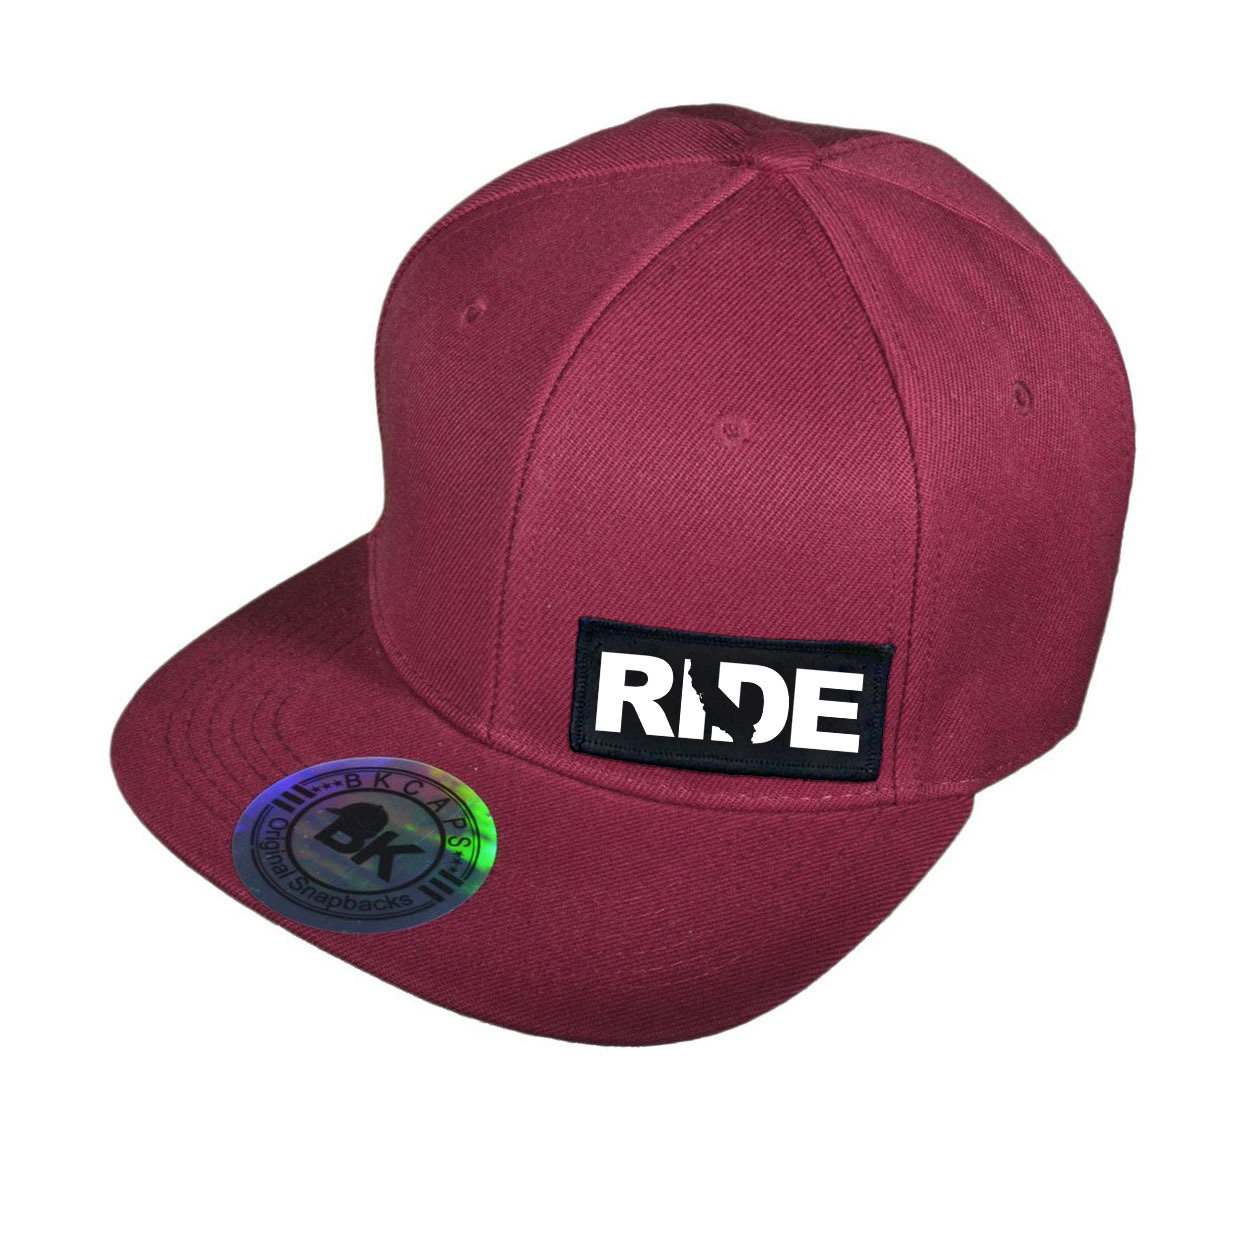 Ride California Night Out Woven Patch Snapback Flat Brim Hat Burgundy (White Logo)